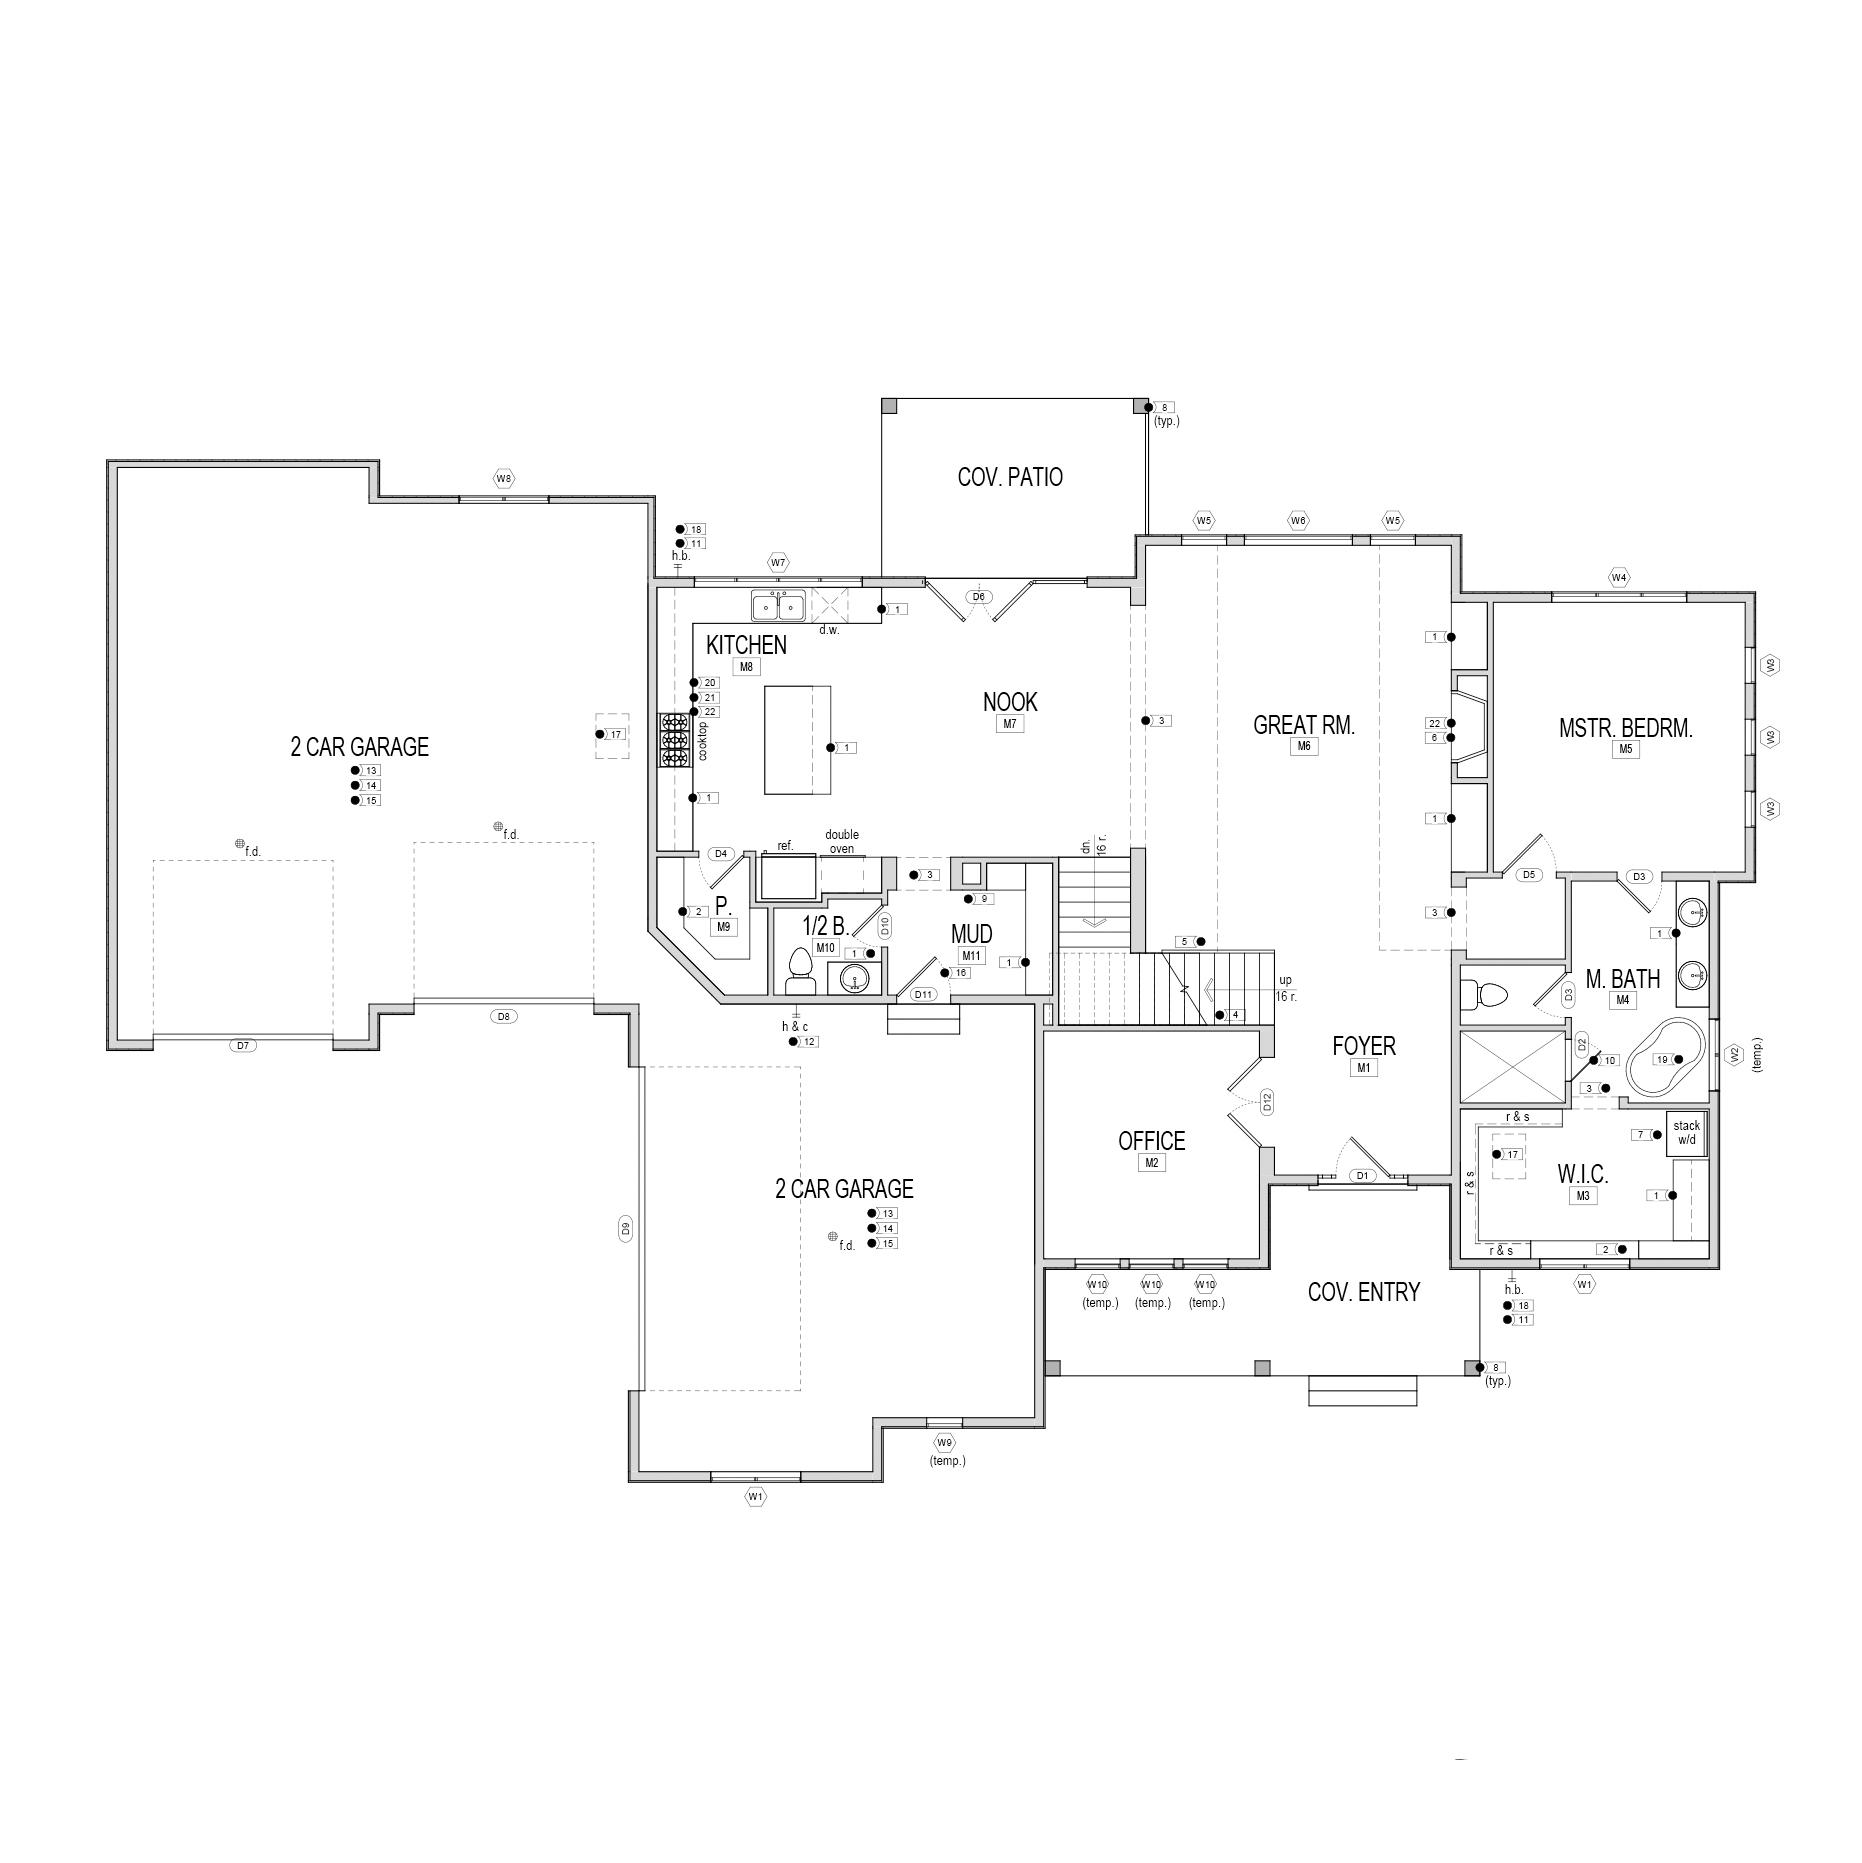 plans_upstairs.jpg